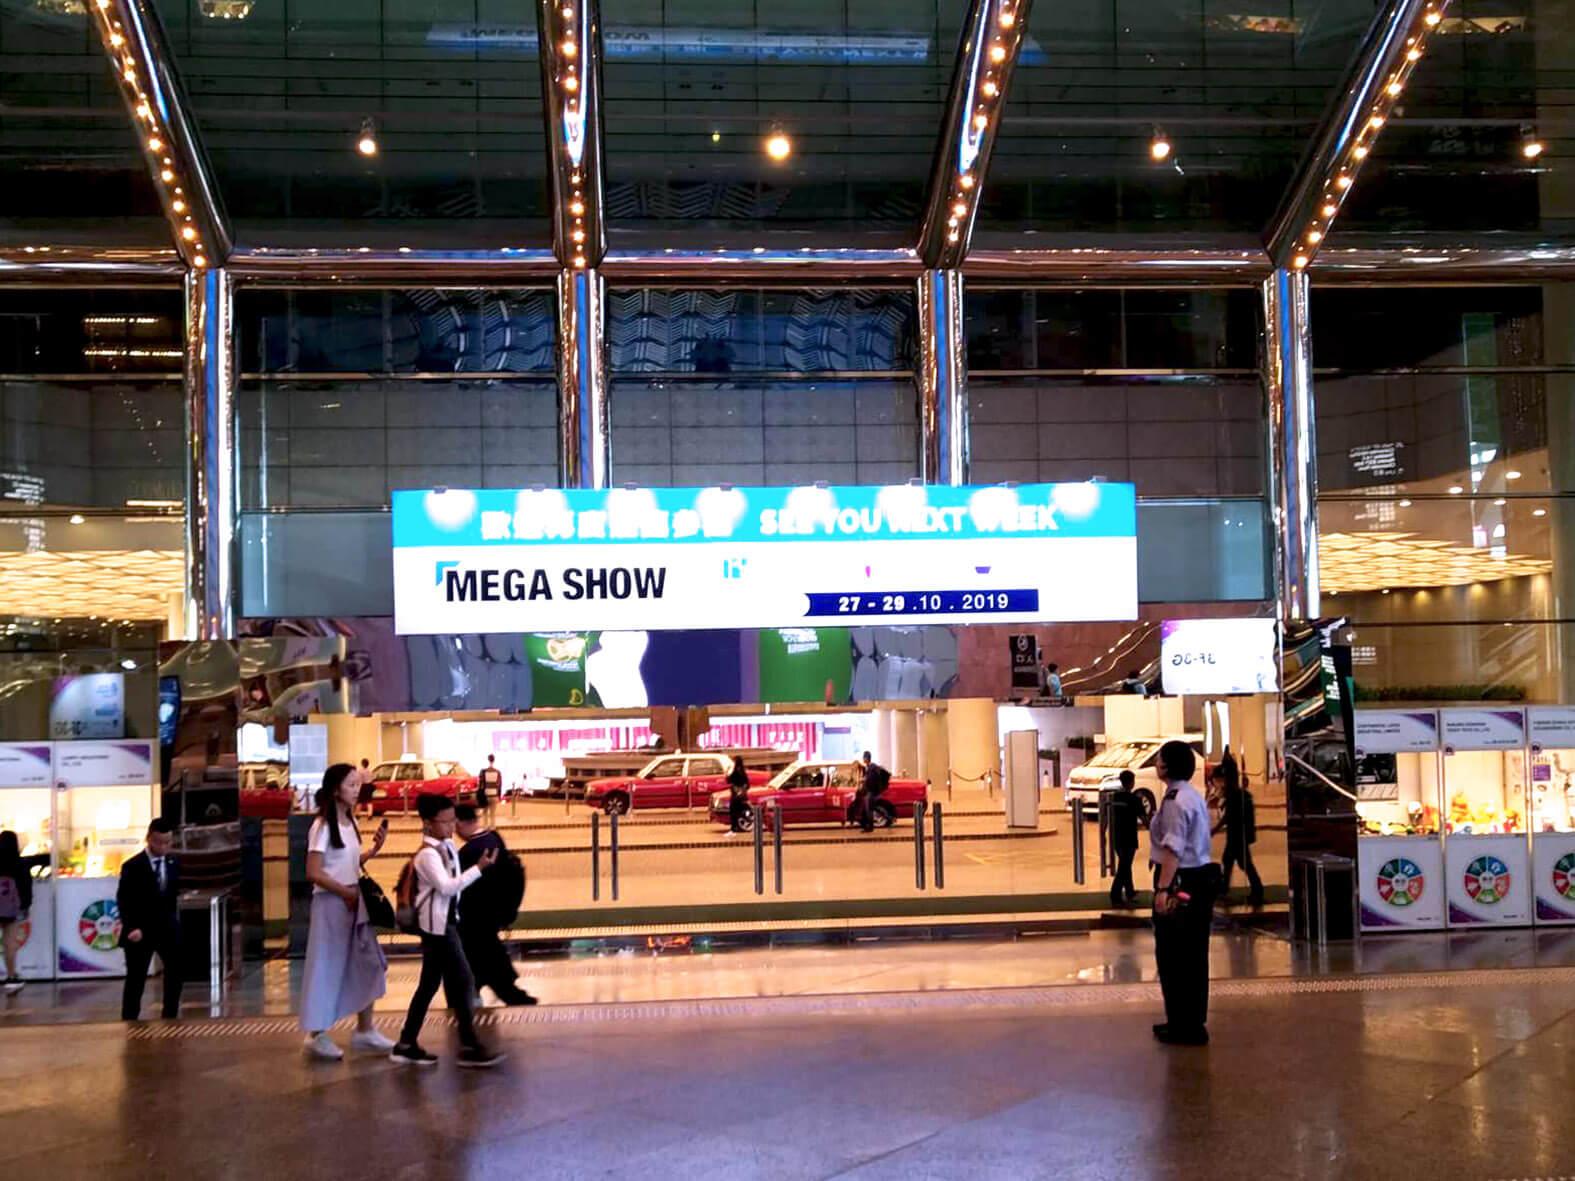 2019.10.20 Hong Kong Mega Show